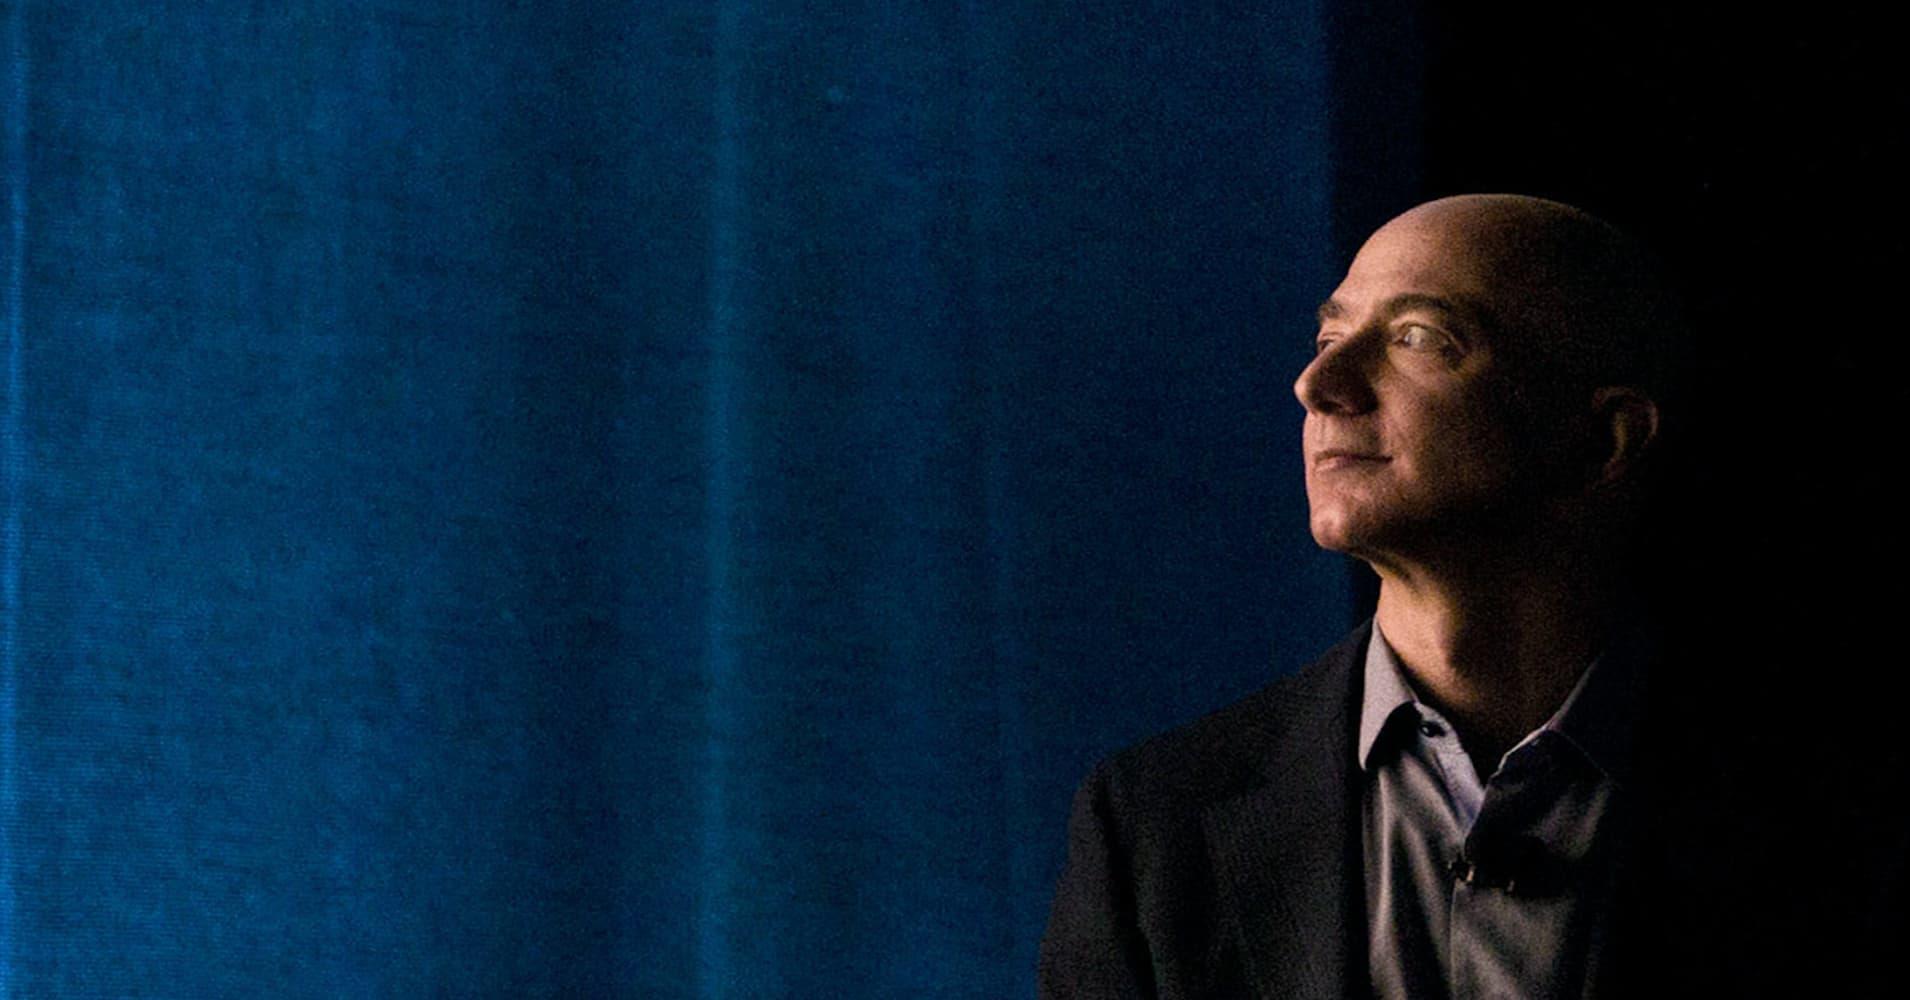 The Surprising Career Advice Jeff Bezos Gave Me